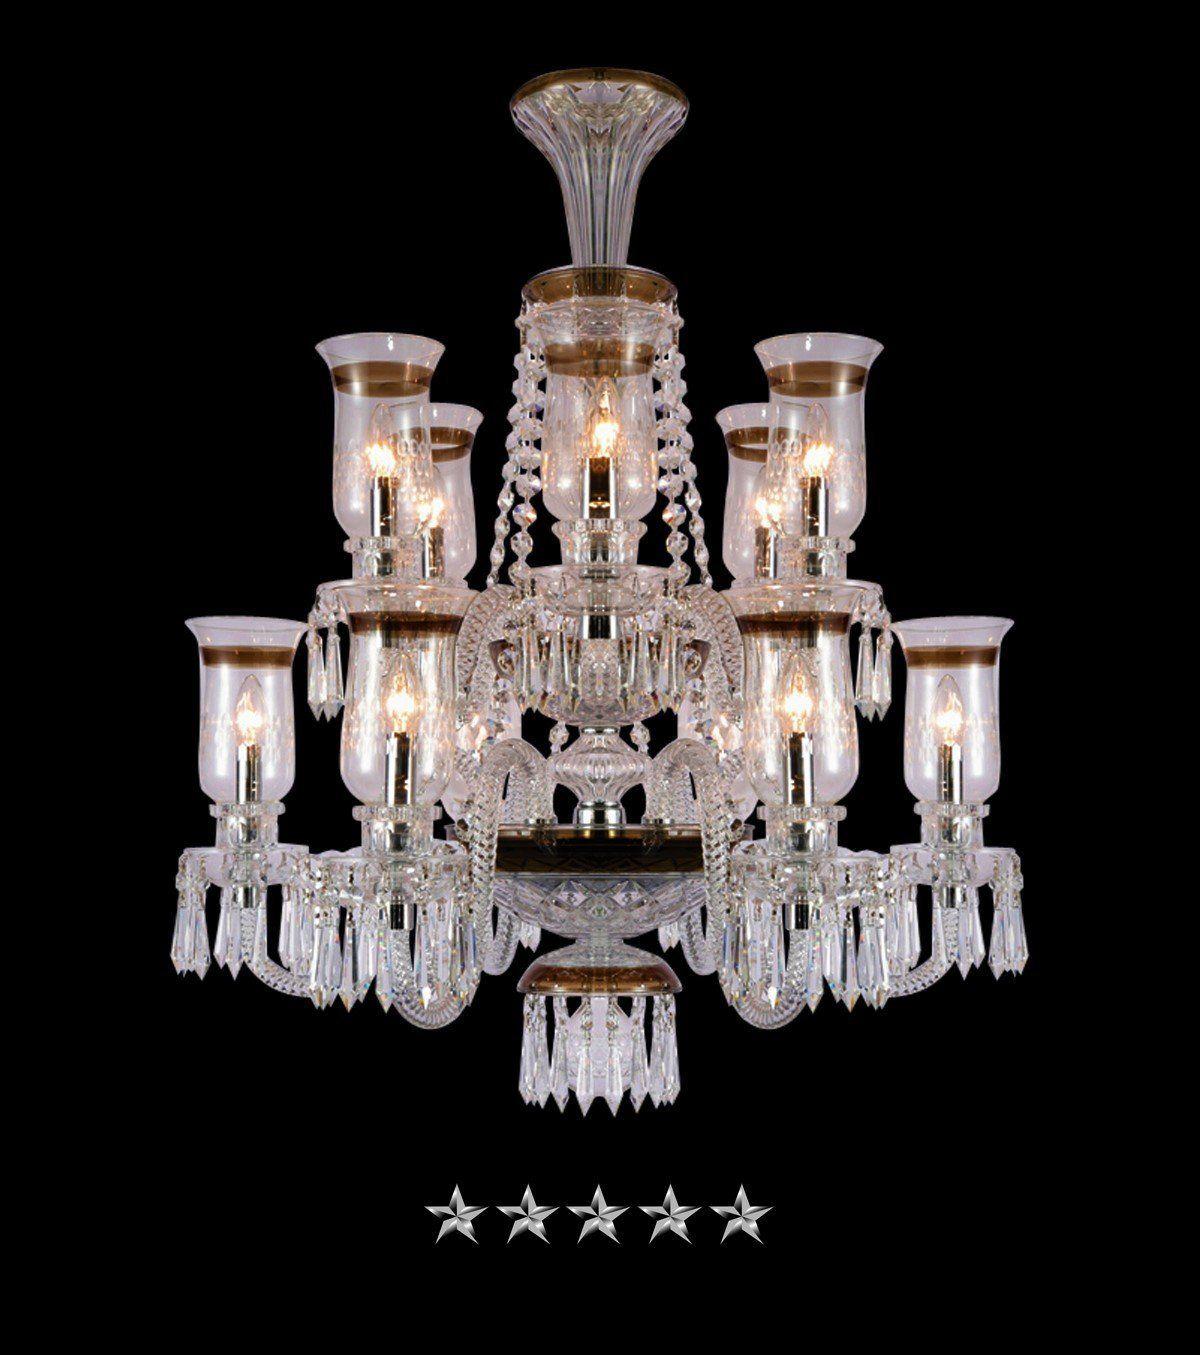 Saint Louis Hurricane Royale 12 Light Crystal Chandelier